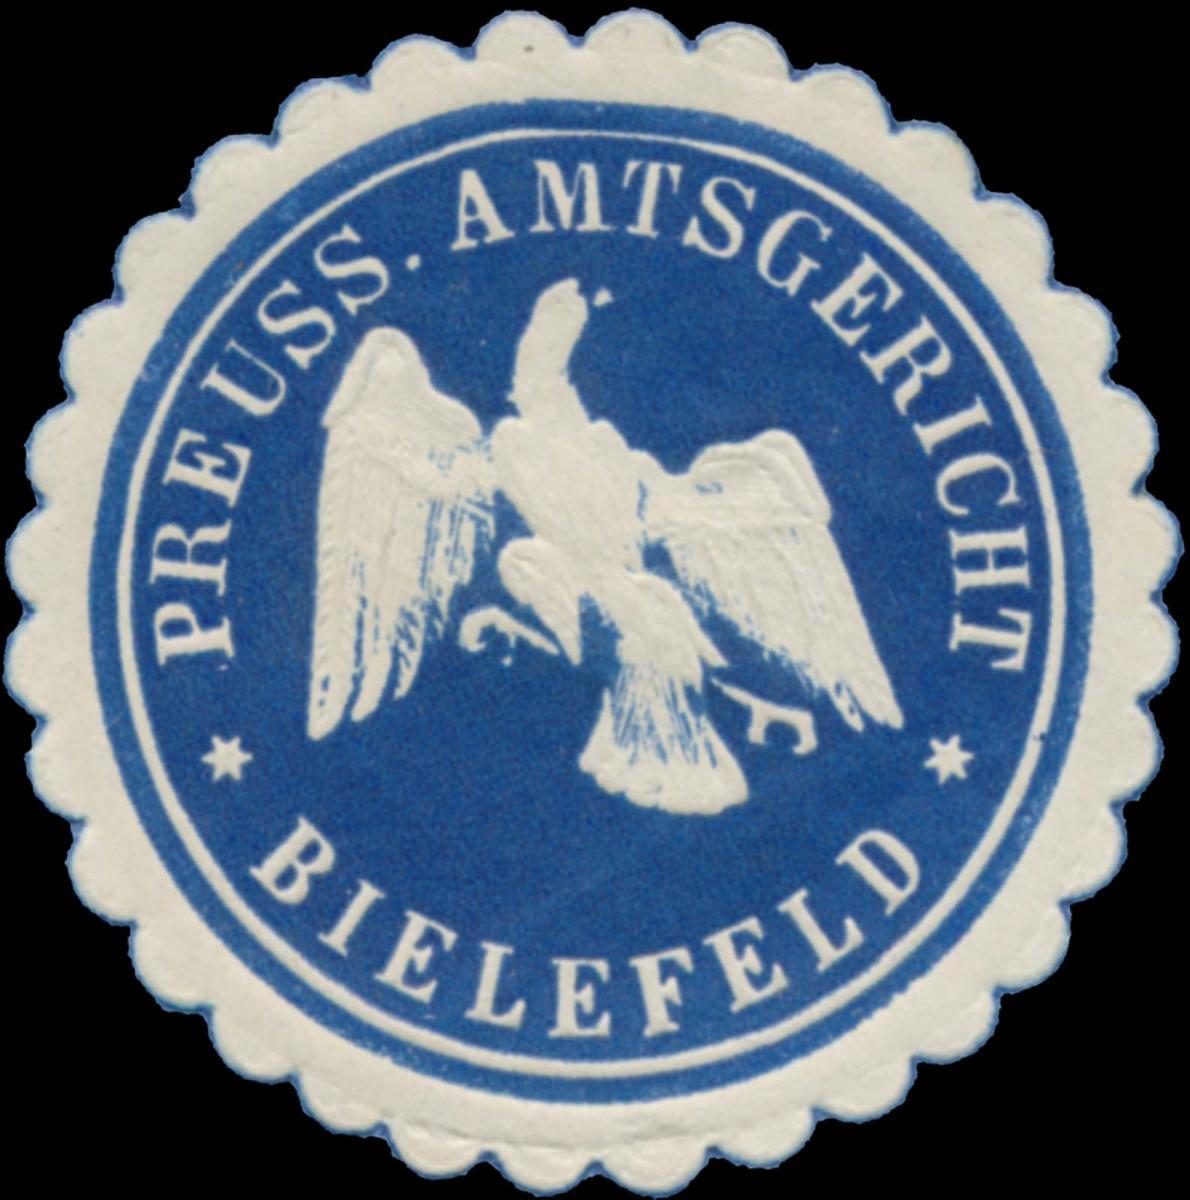 Pr. Amtsgericht Bielefeld